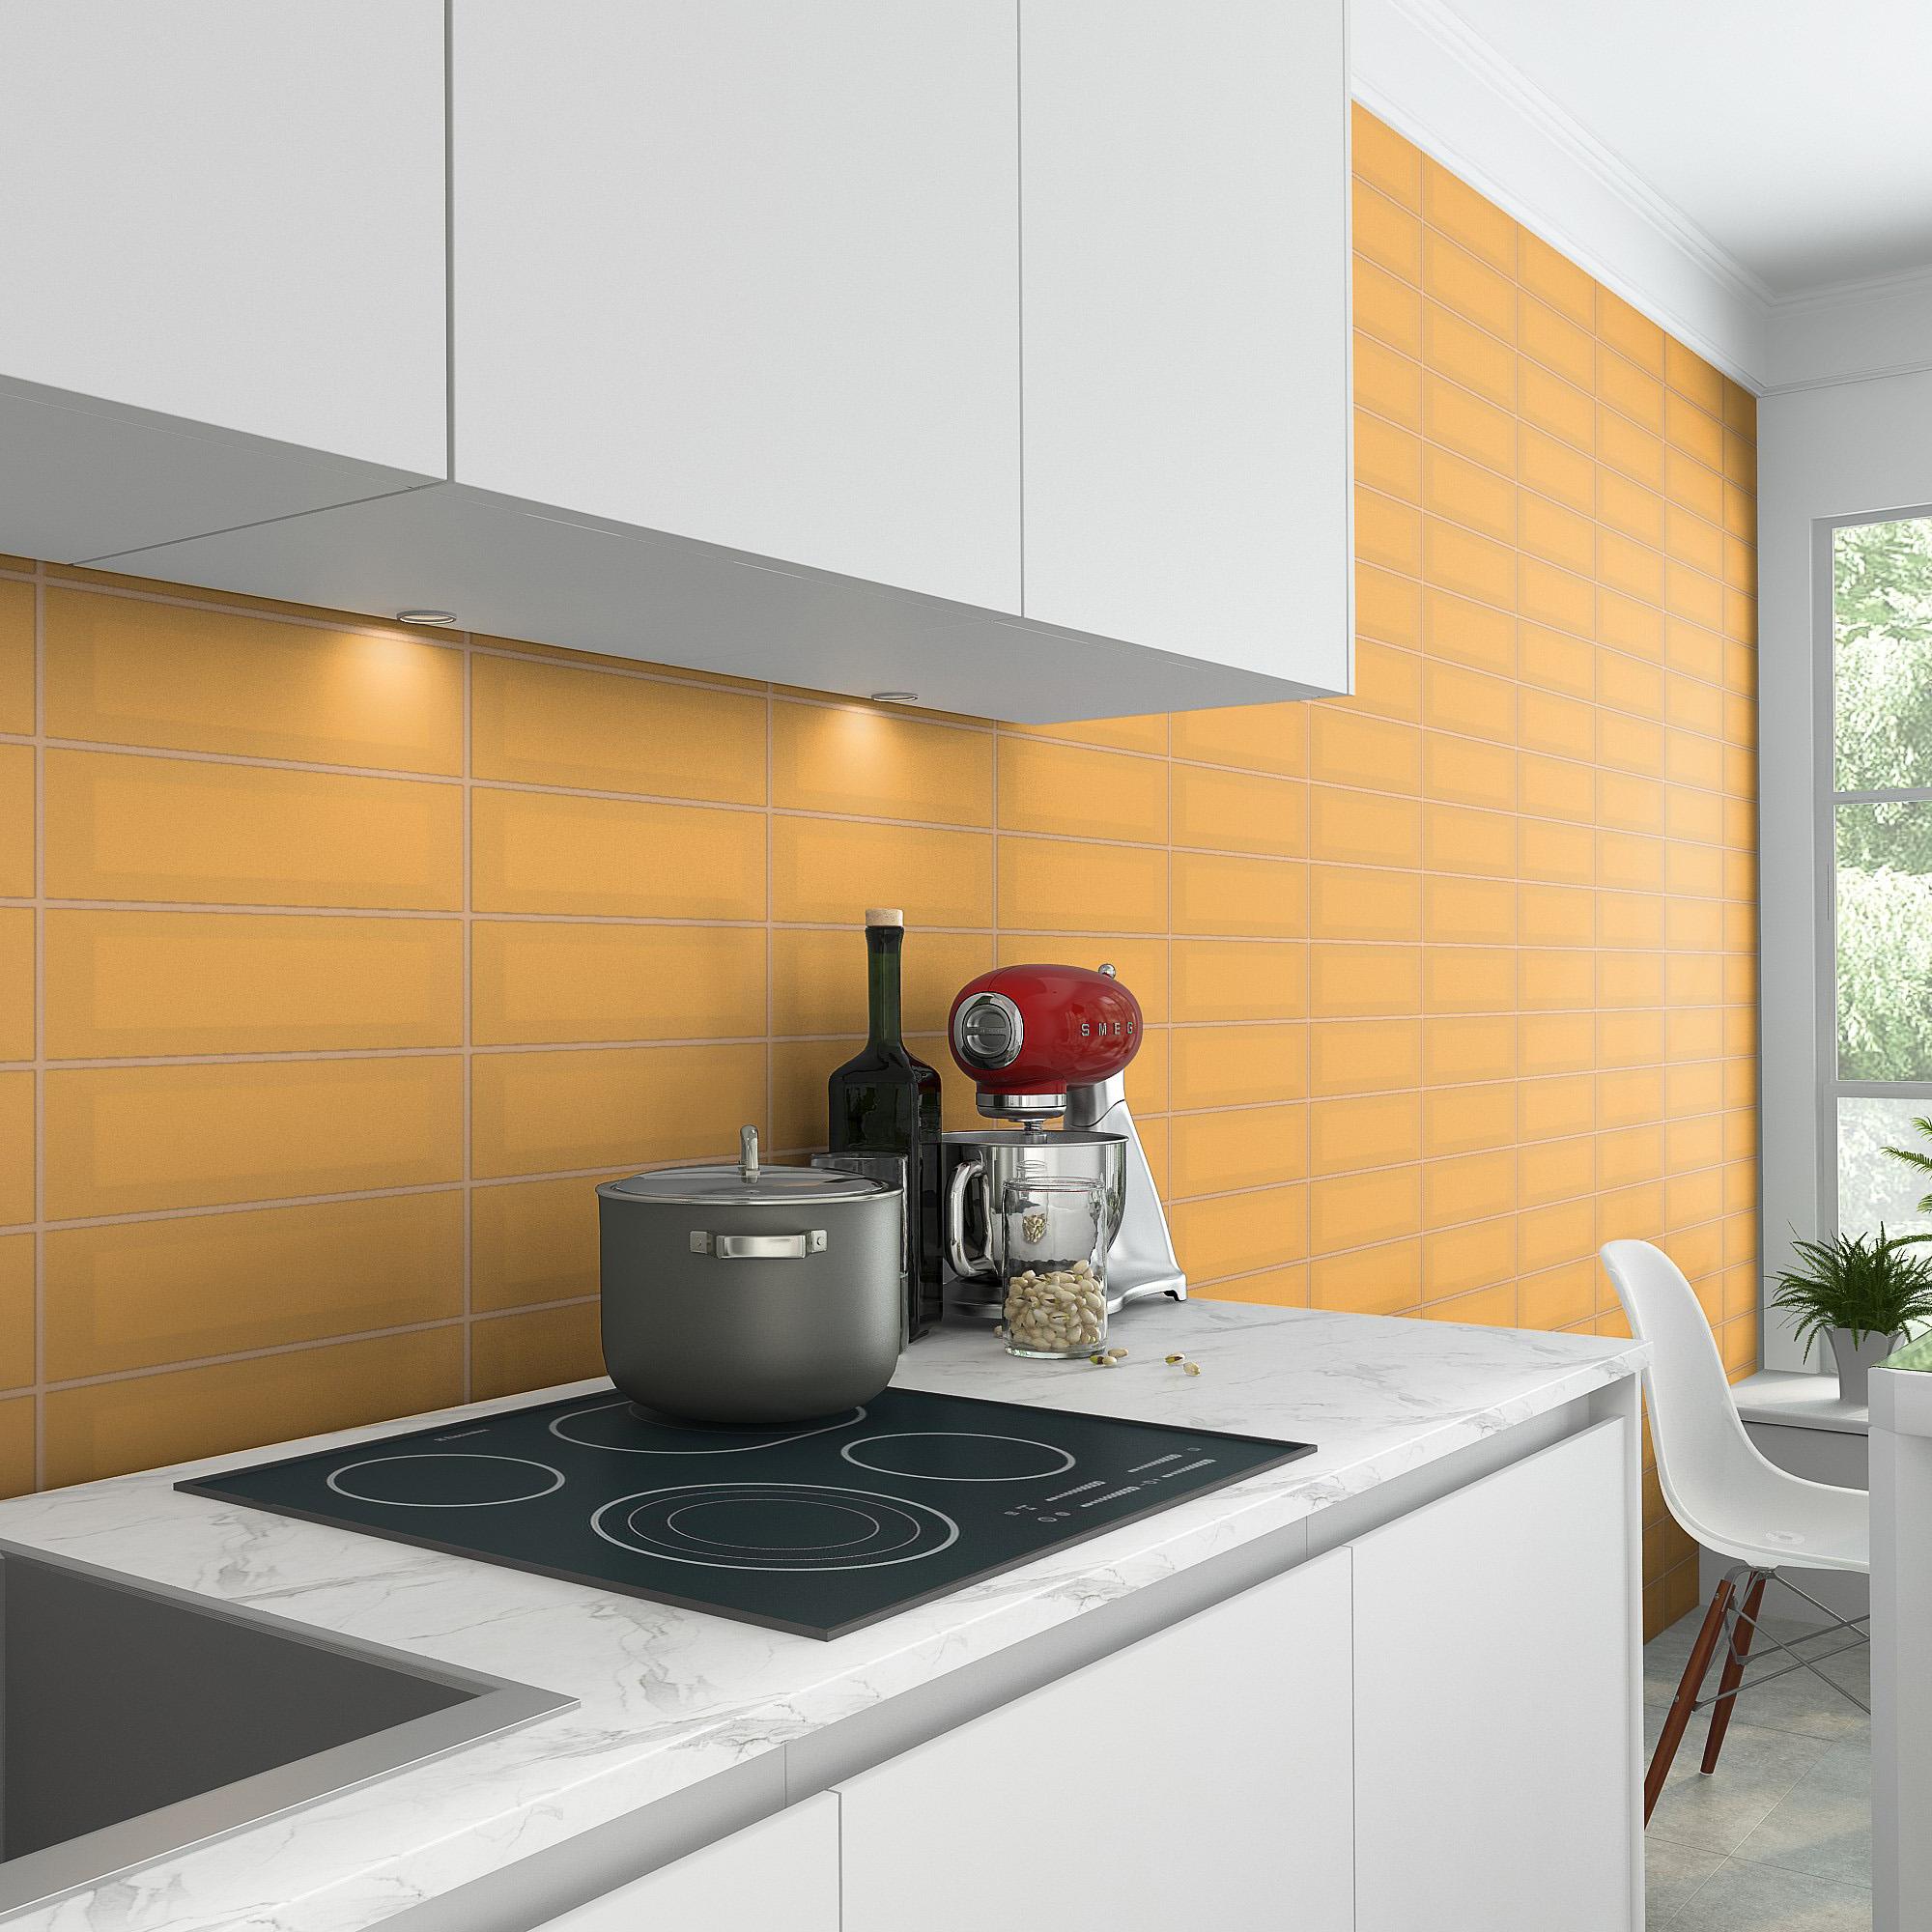 Fasat Kakel Monocolor Orange Mustard Matt 10x30 cm